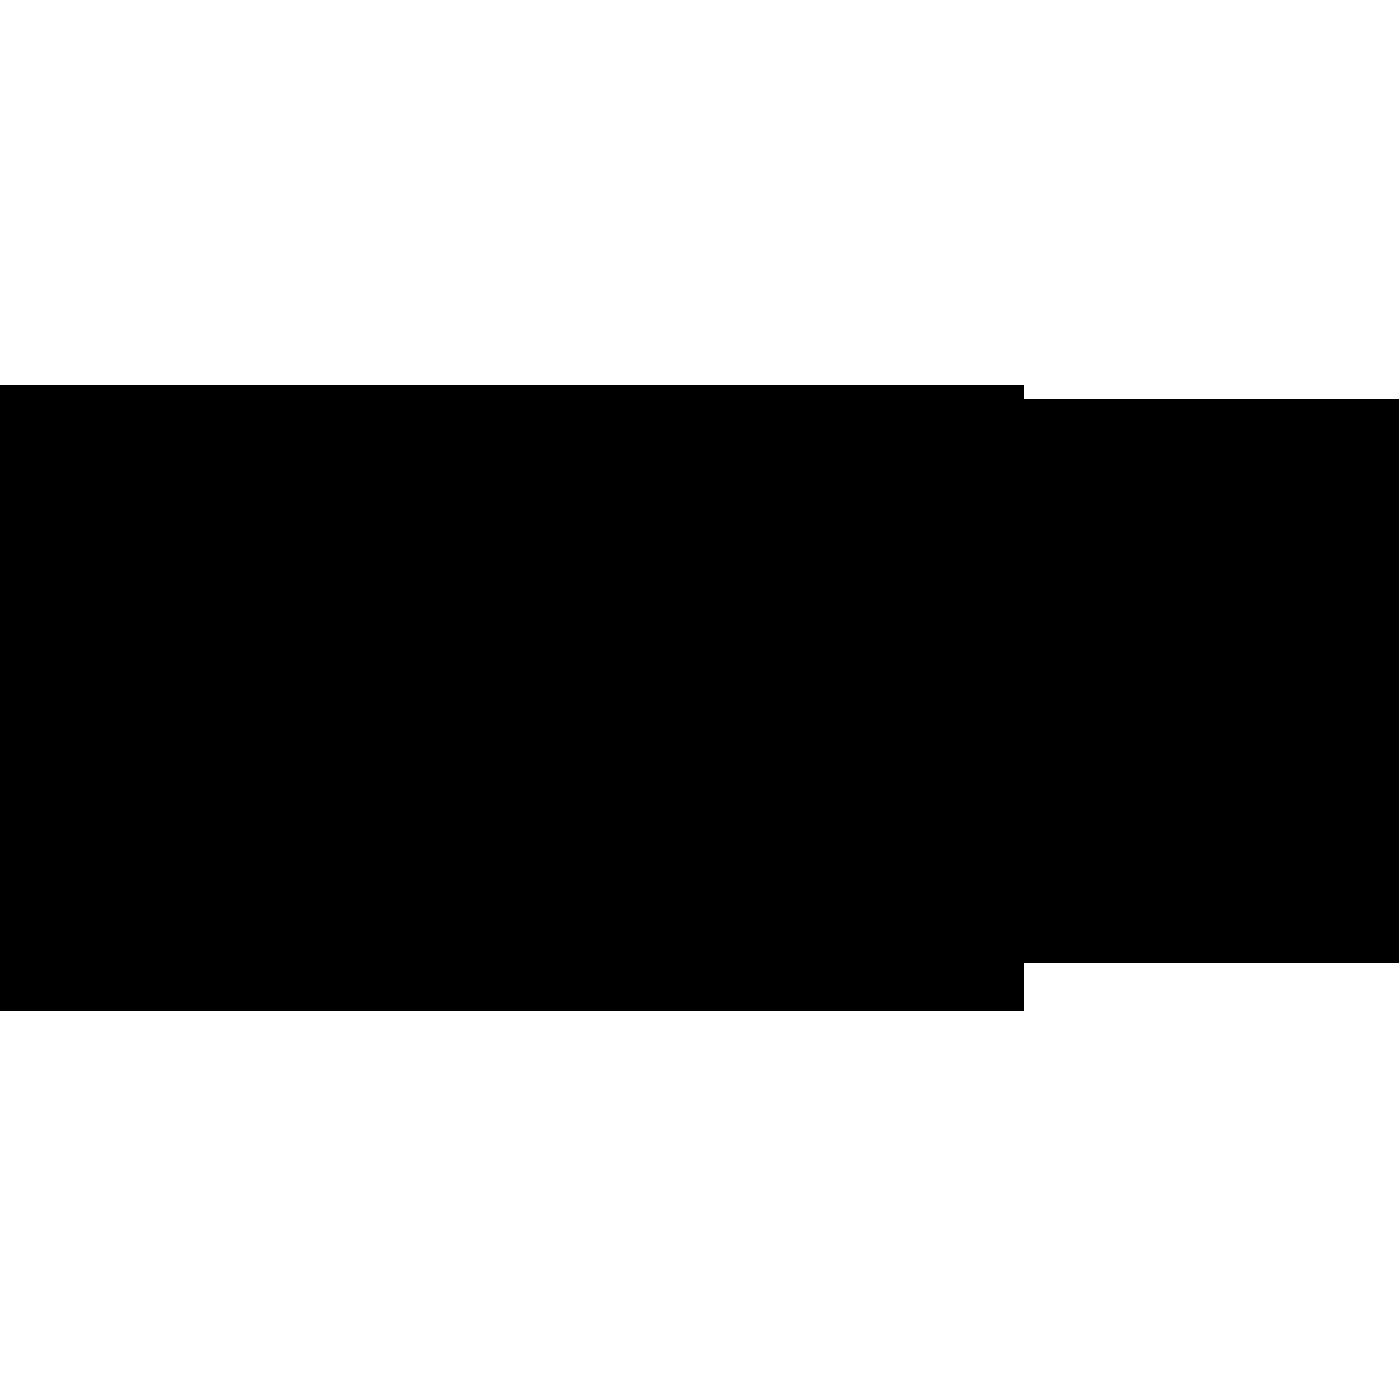 router keygen pro apk 2018